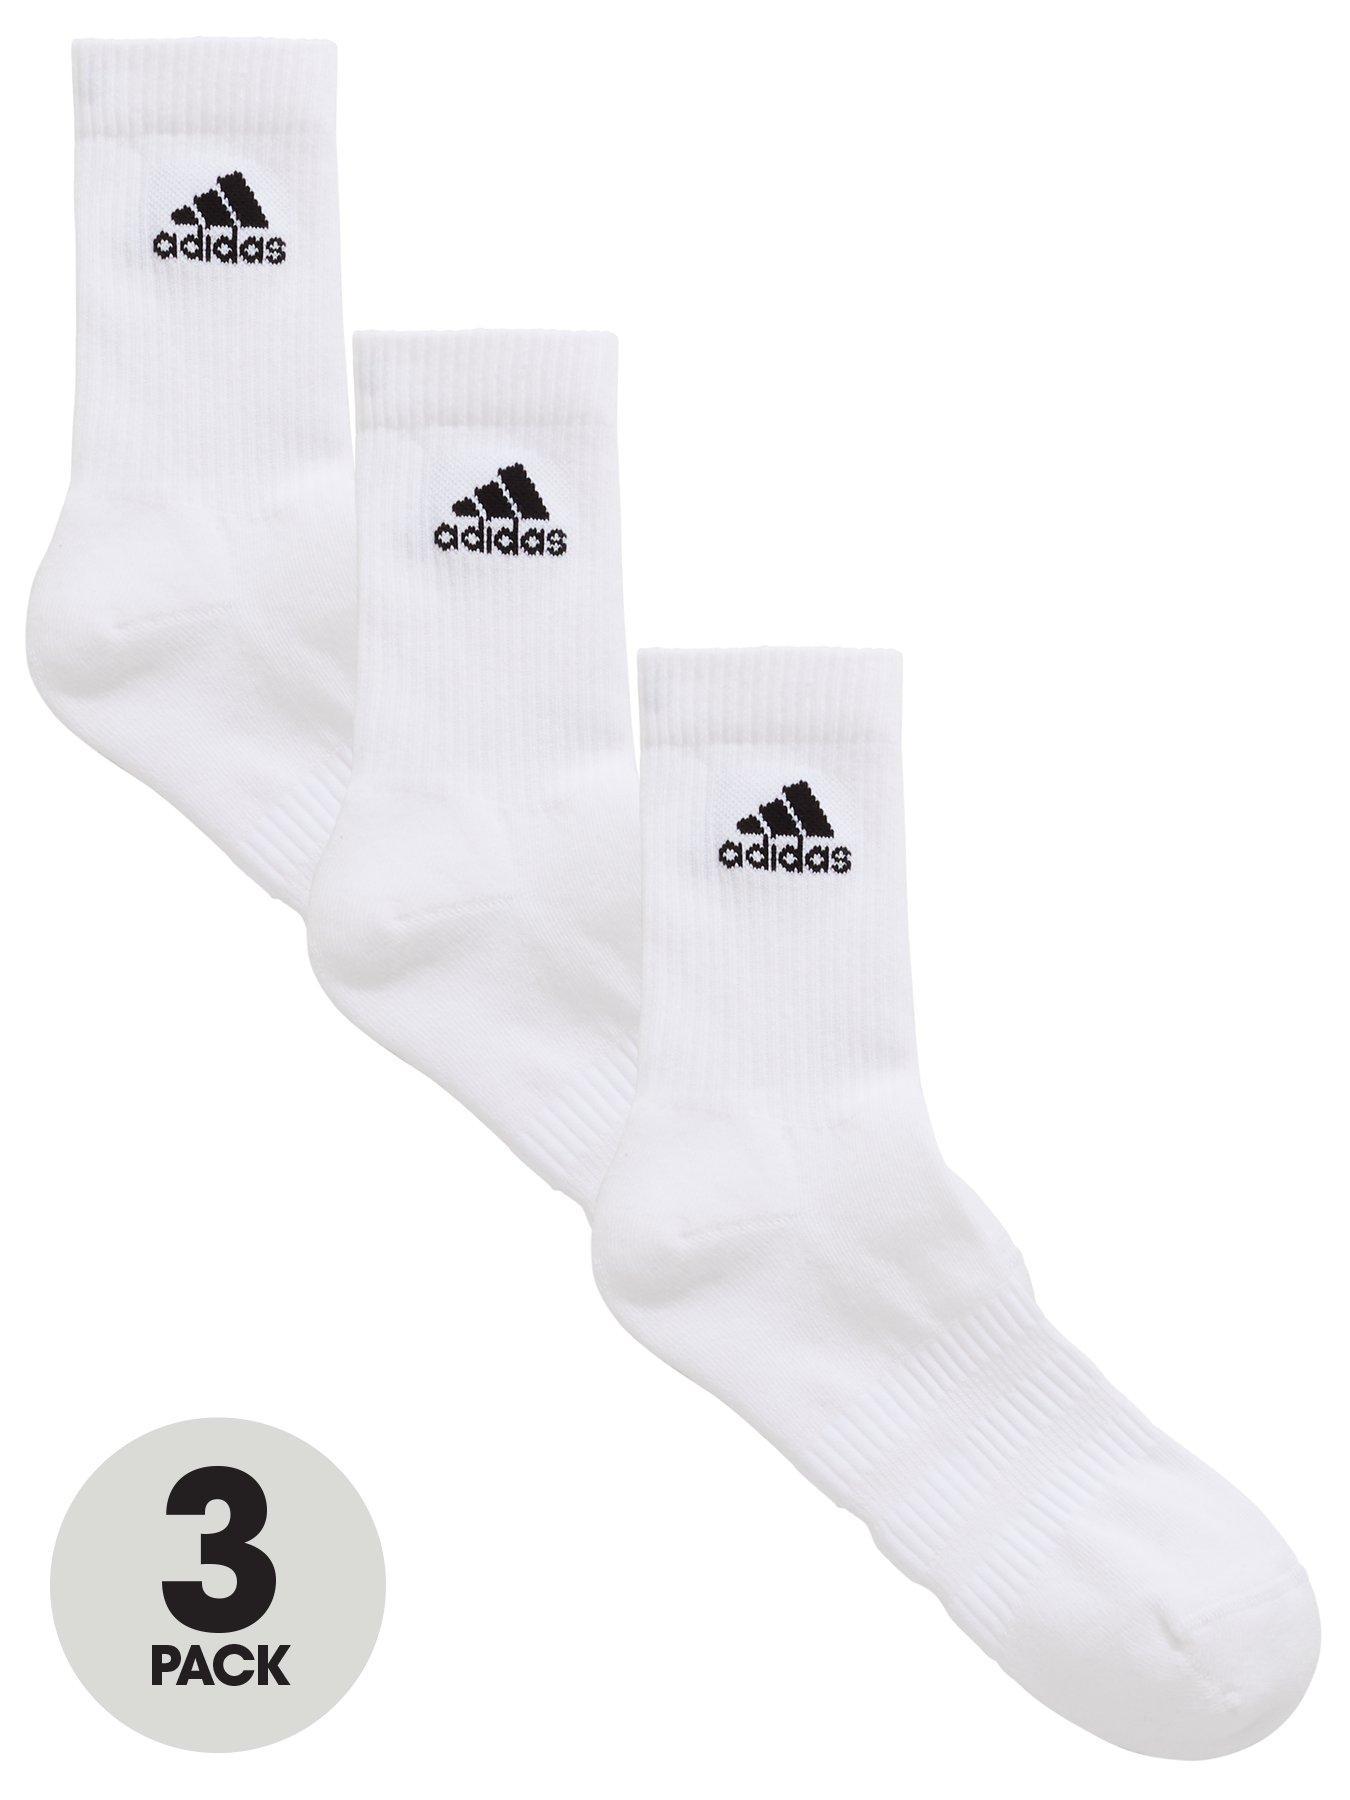 12 Pairs Mens Sports Socks Extra comfort Training Cotton Socks Size 6-11 6